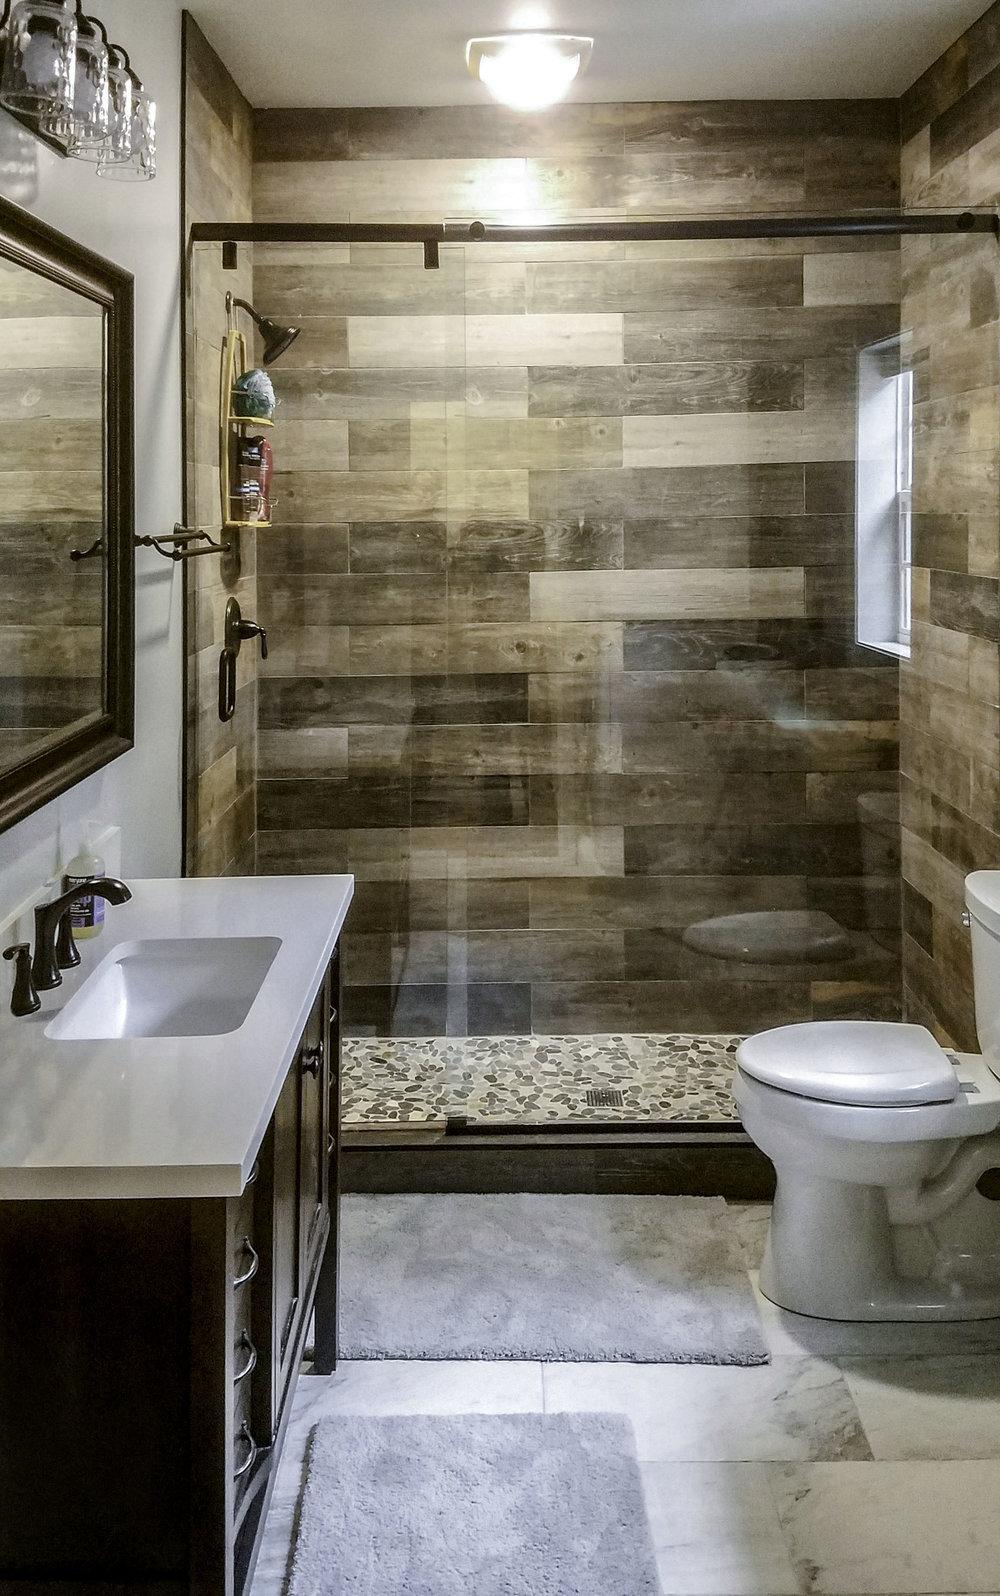 r2sr bathroom11edit final.jpg